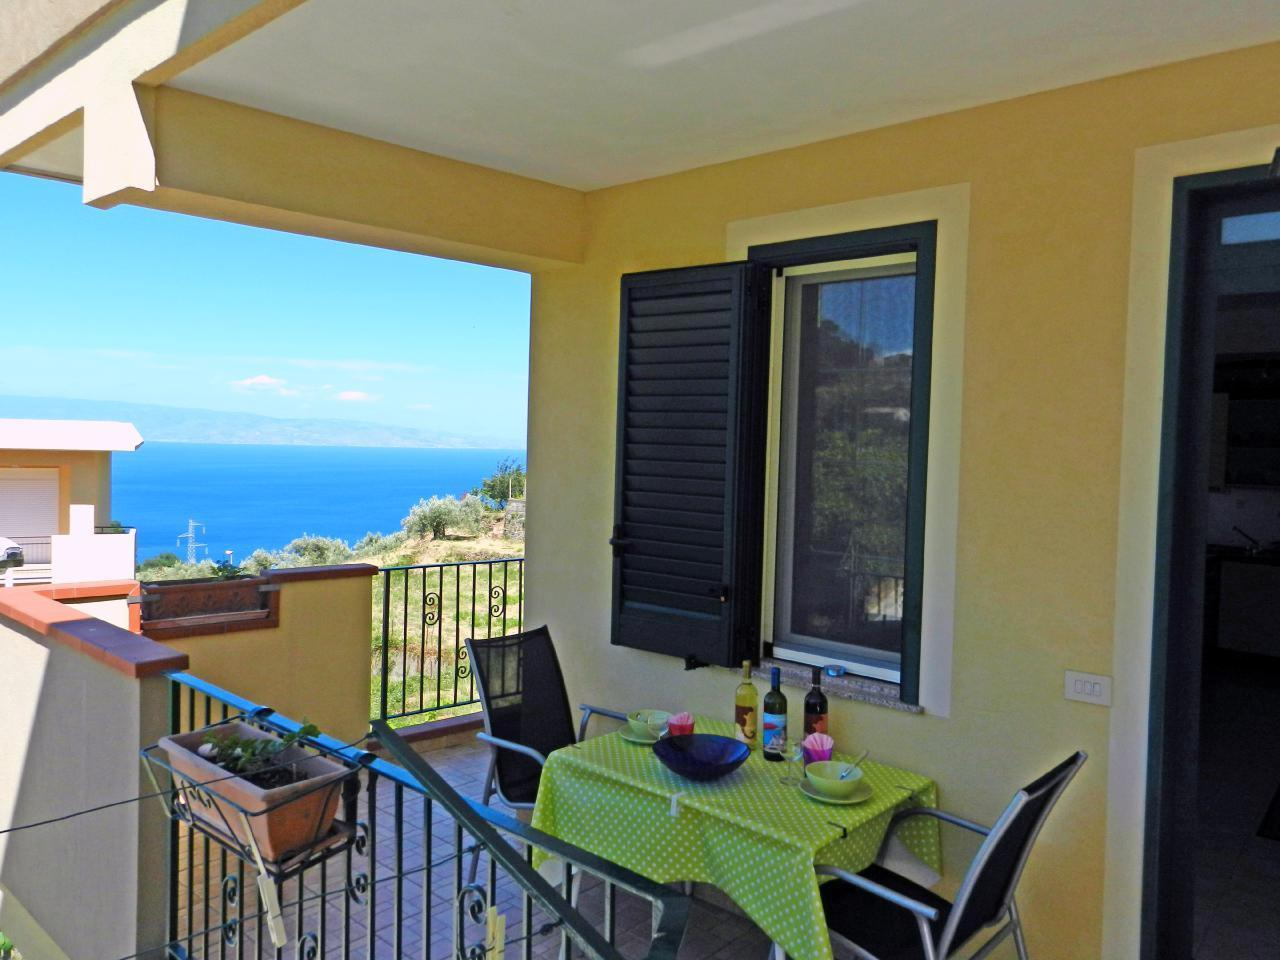 Appartement de vacances Fewo mit Balkon im Panorama-Dorf bei Taormina (737398), Forza d'Agro', Messina, Sicile, Italie, image 9